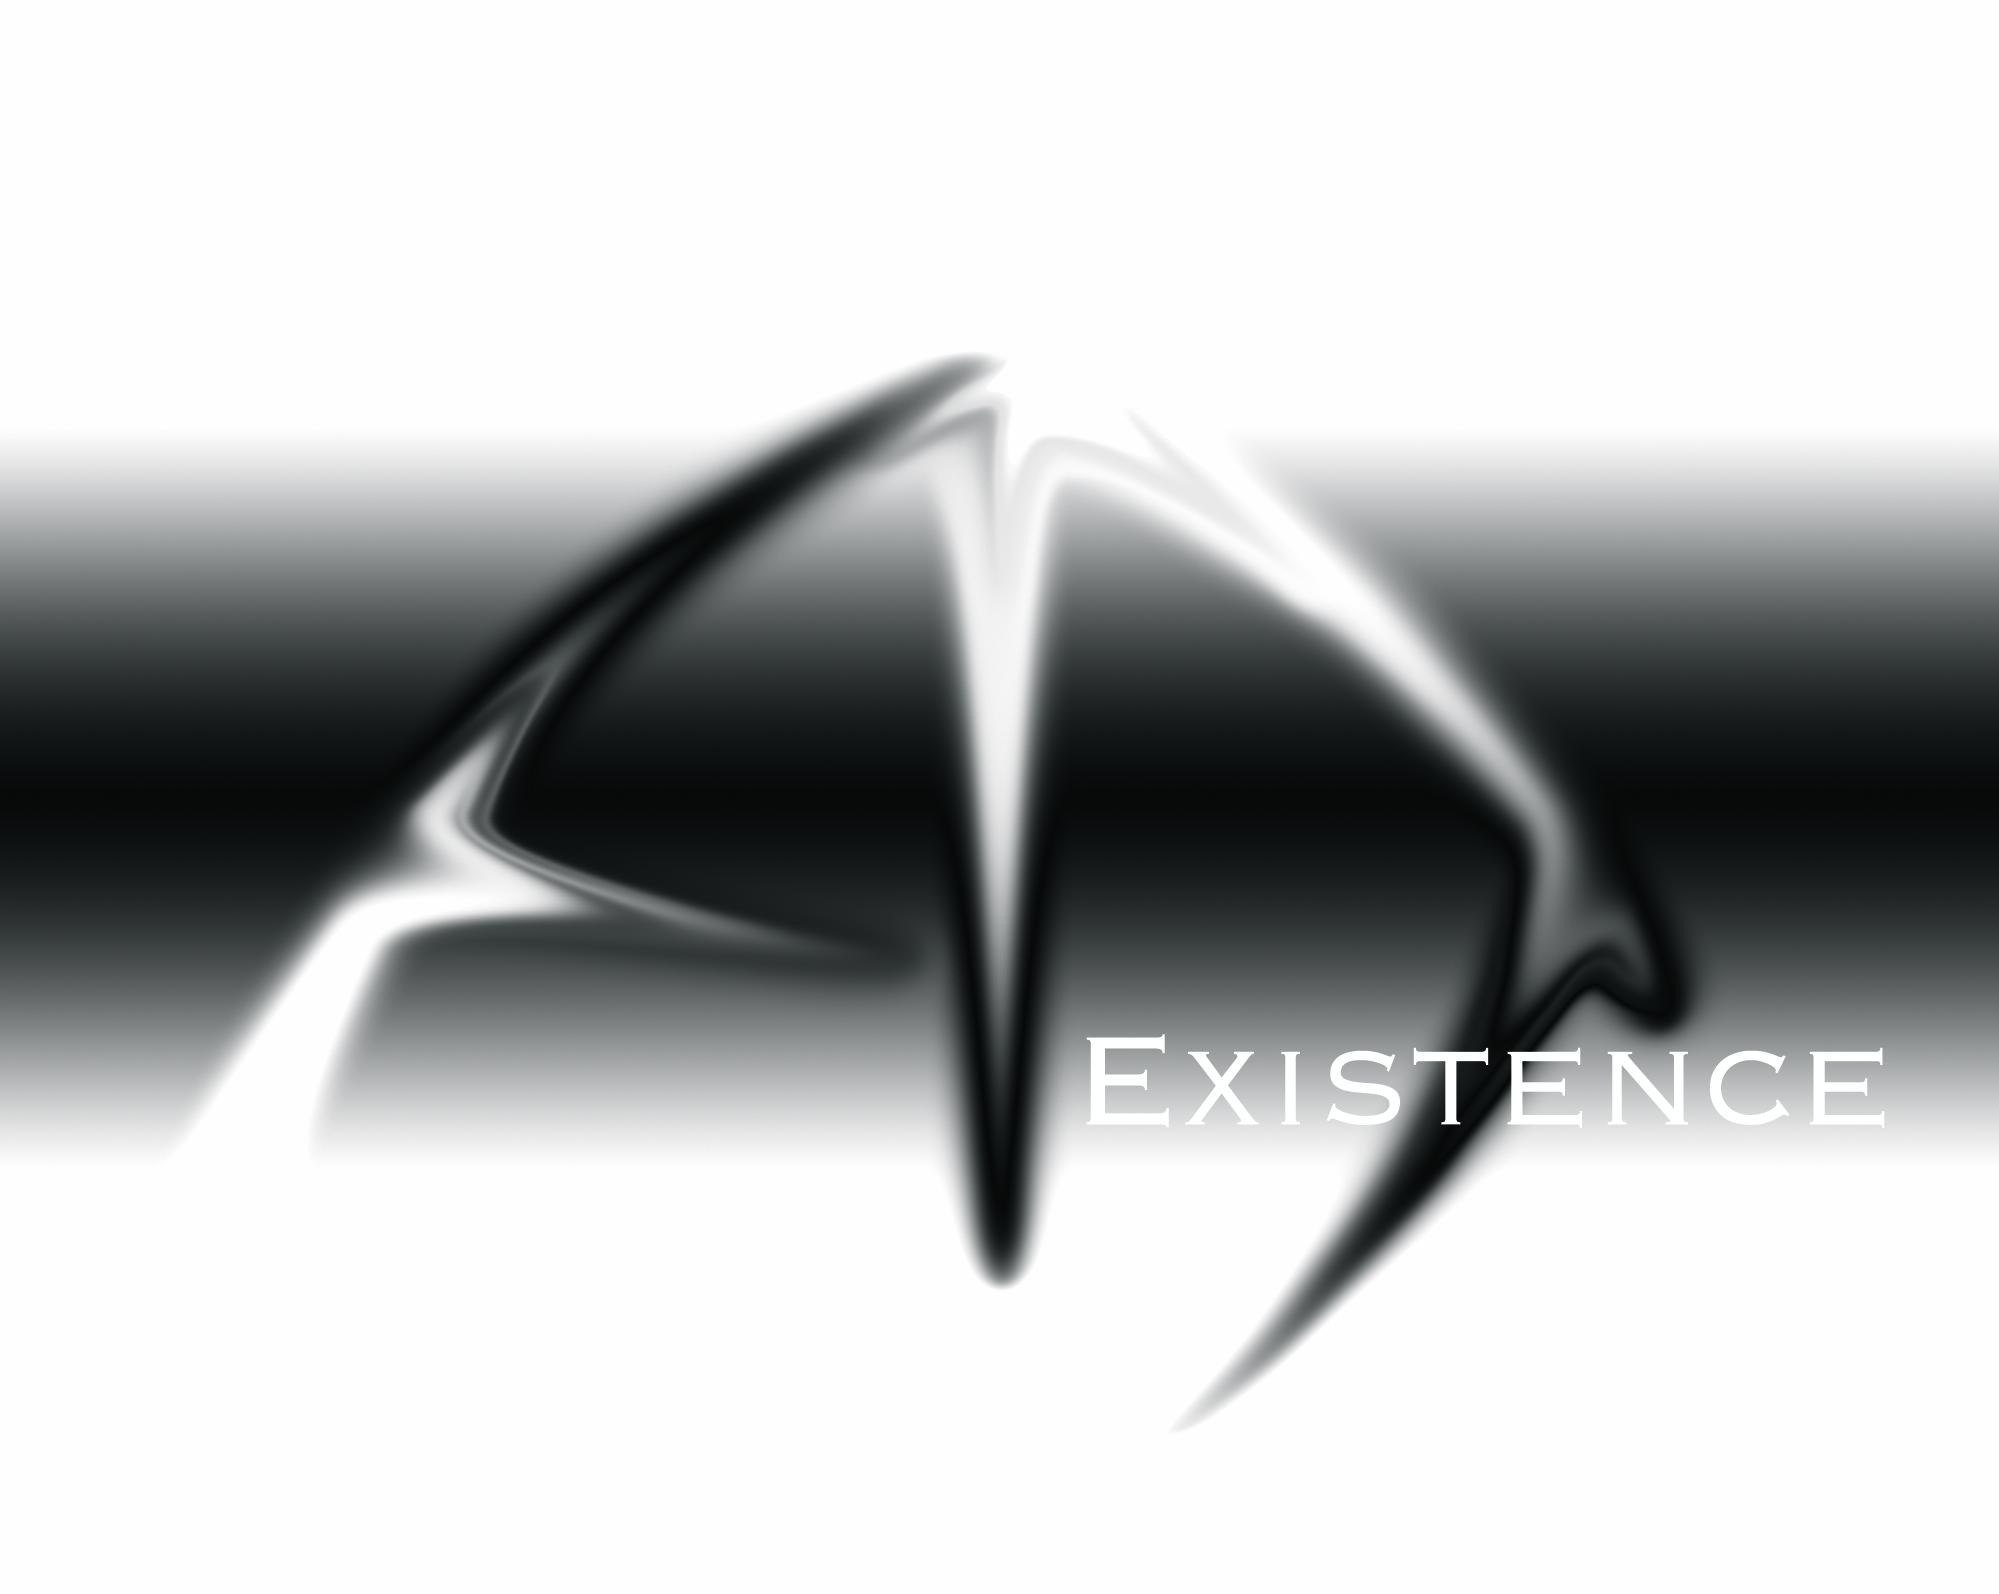 Existence cover.jpg